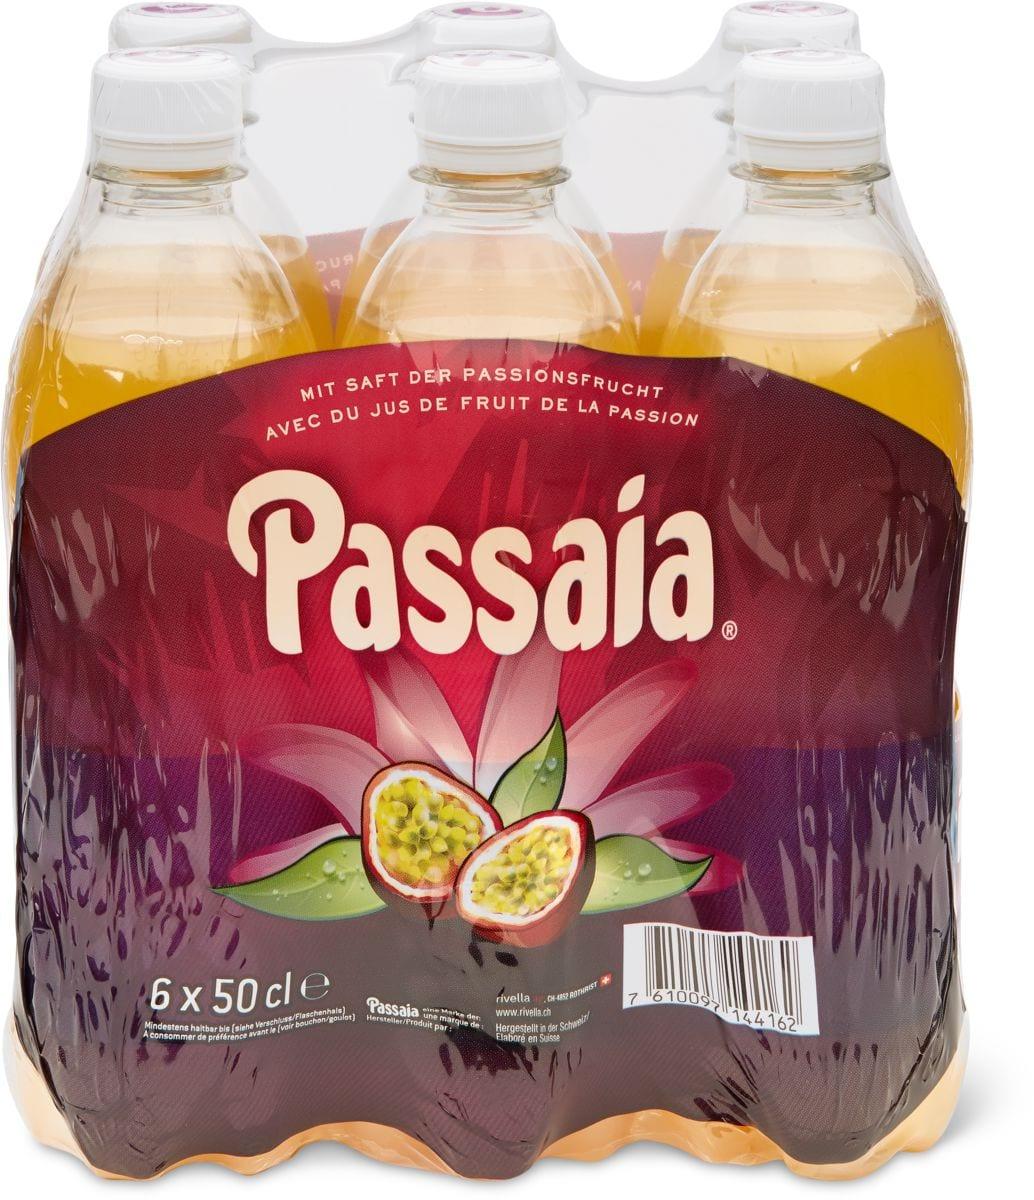 Passaia